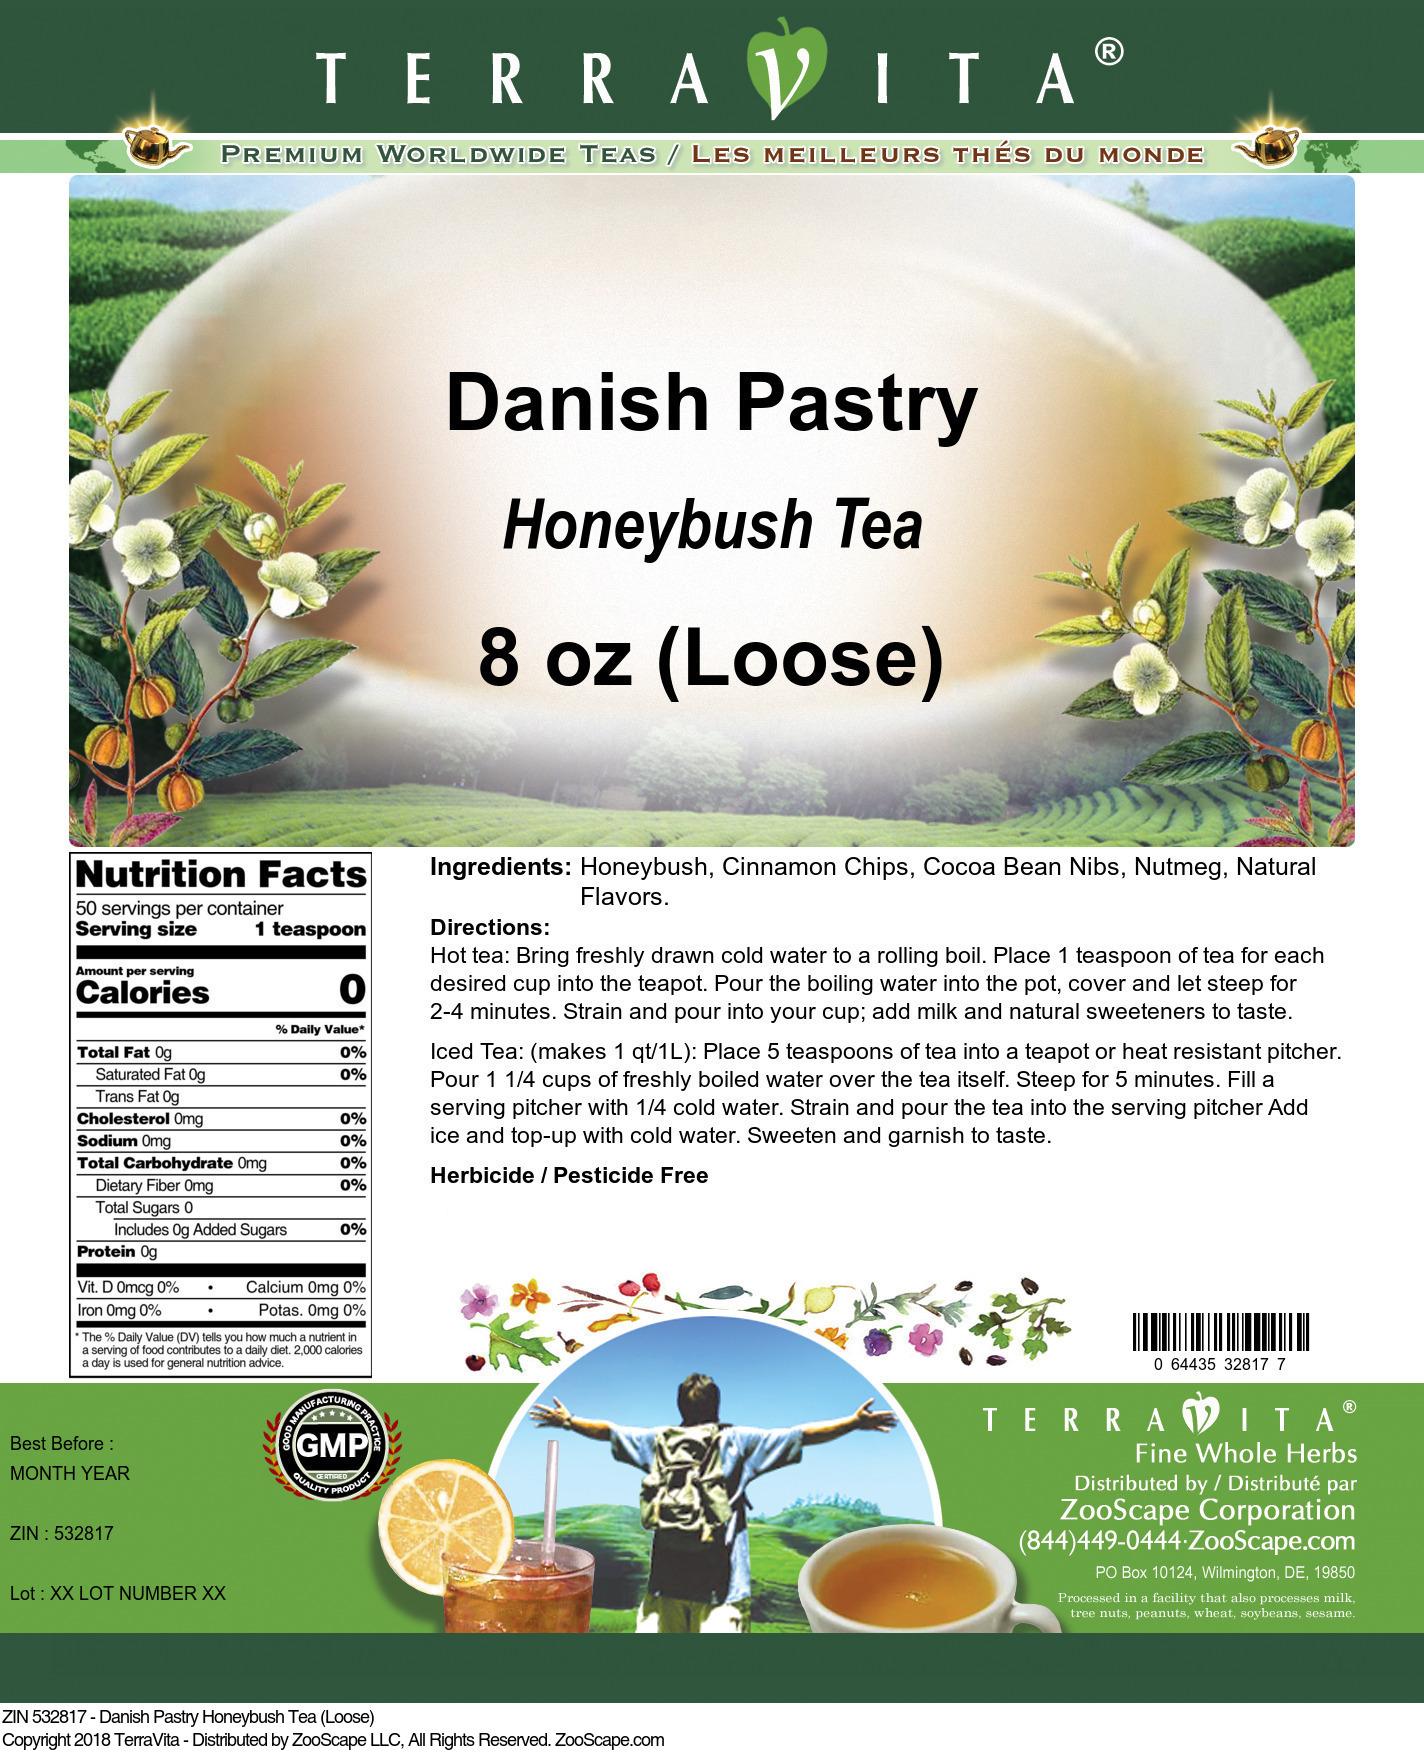 Danish Pastry Honeybush Tea (Loose)